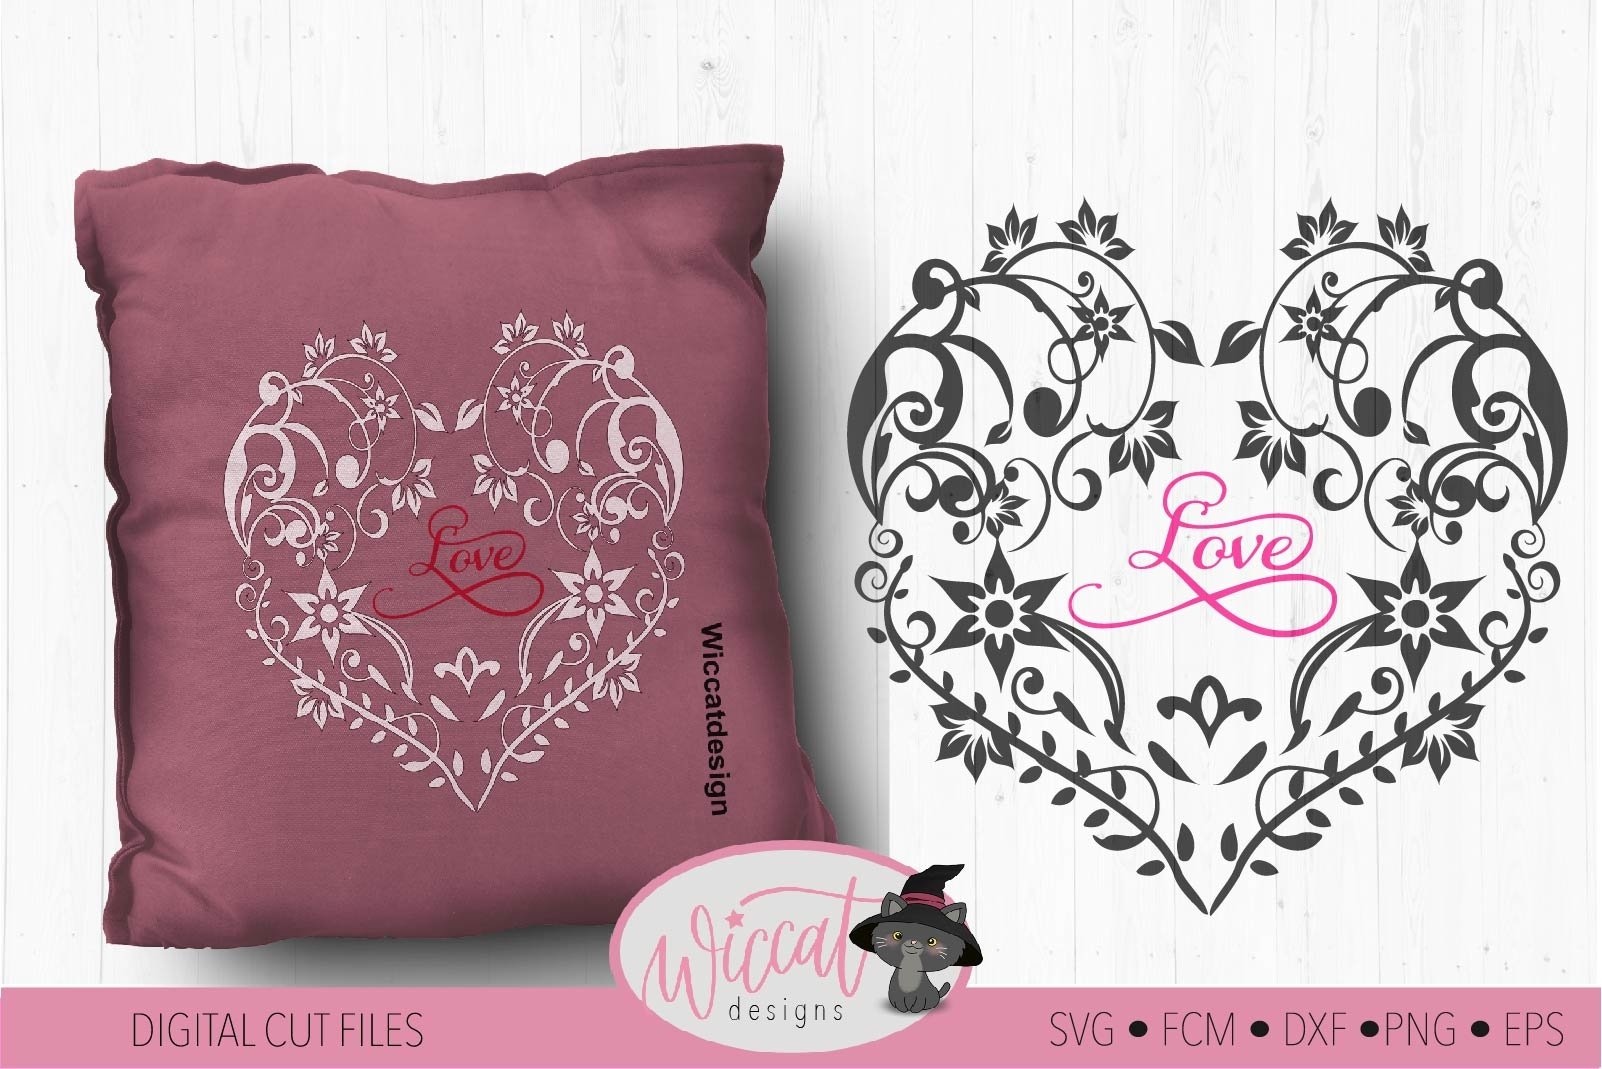 Flower Heart Svg Mothers Day Lace Cut File Glass Block 55043 Svgs Design Bundles